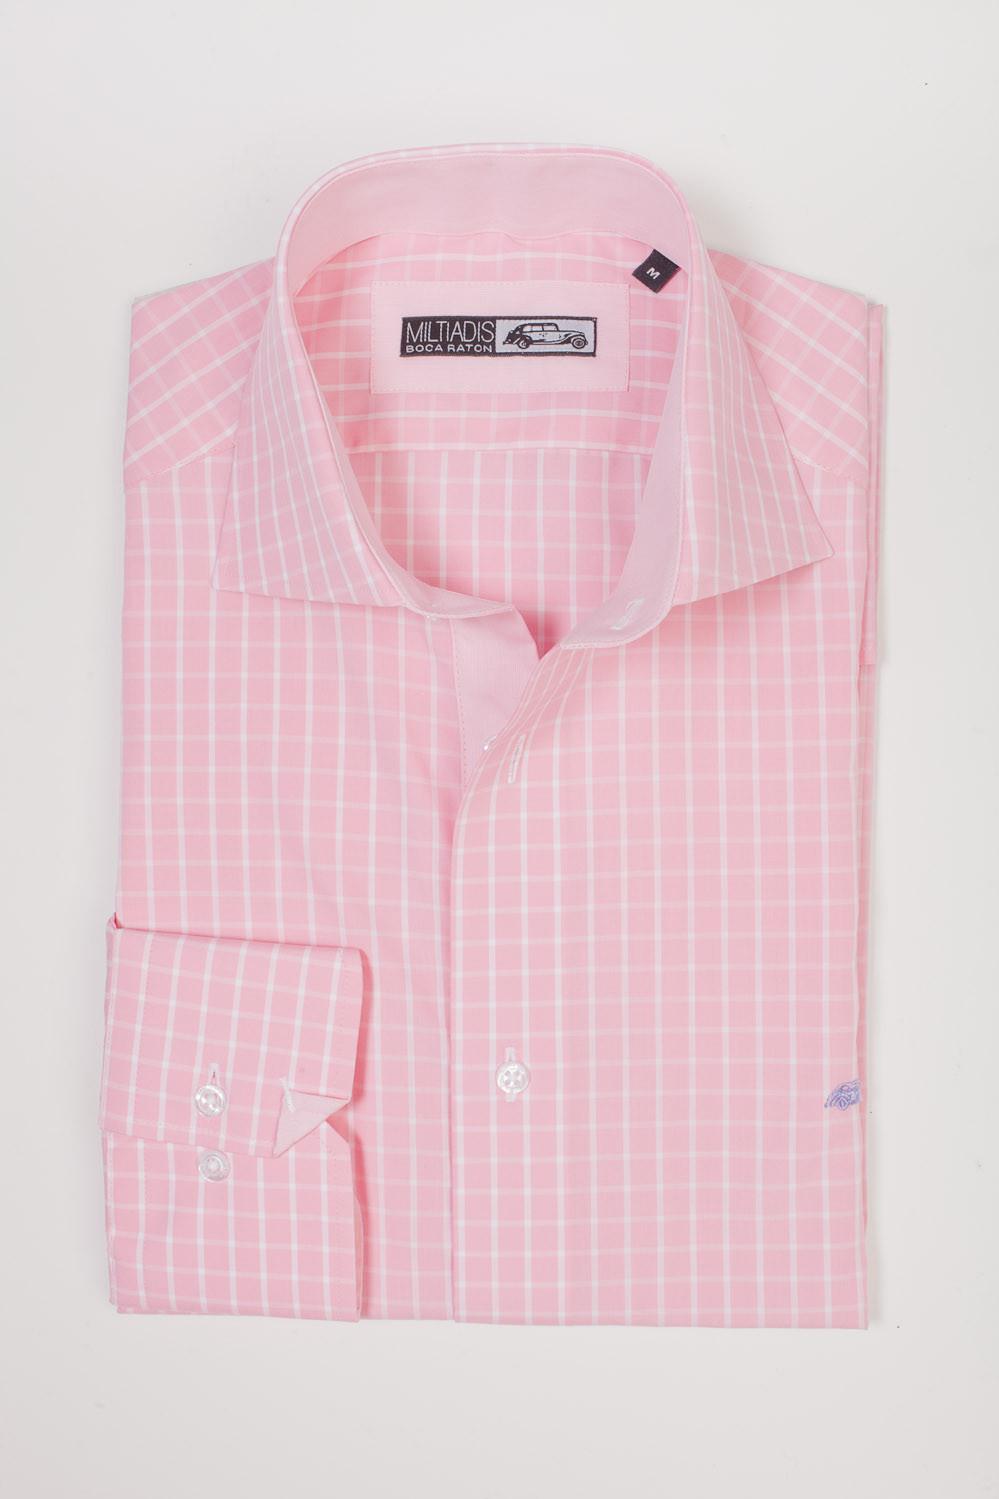 Men's Dress Shirts | Miltiadis XIII 11 | Miltiadis